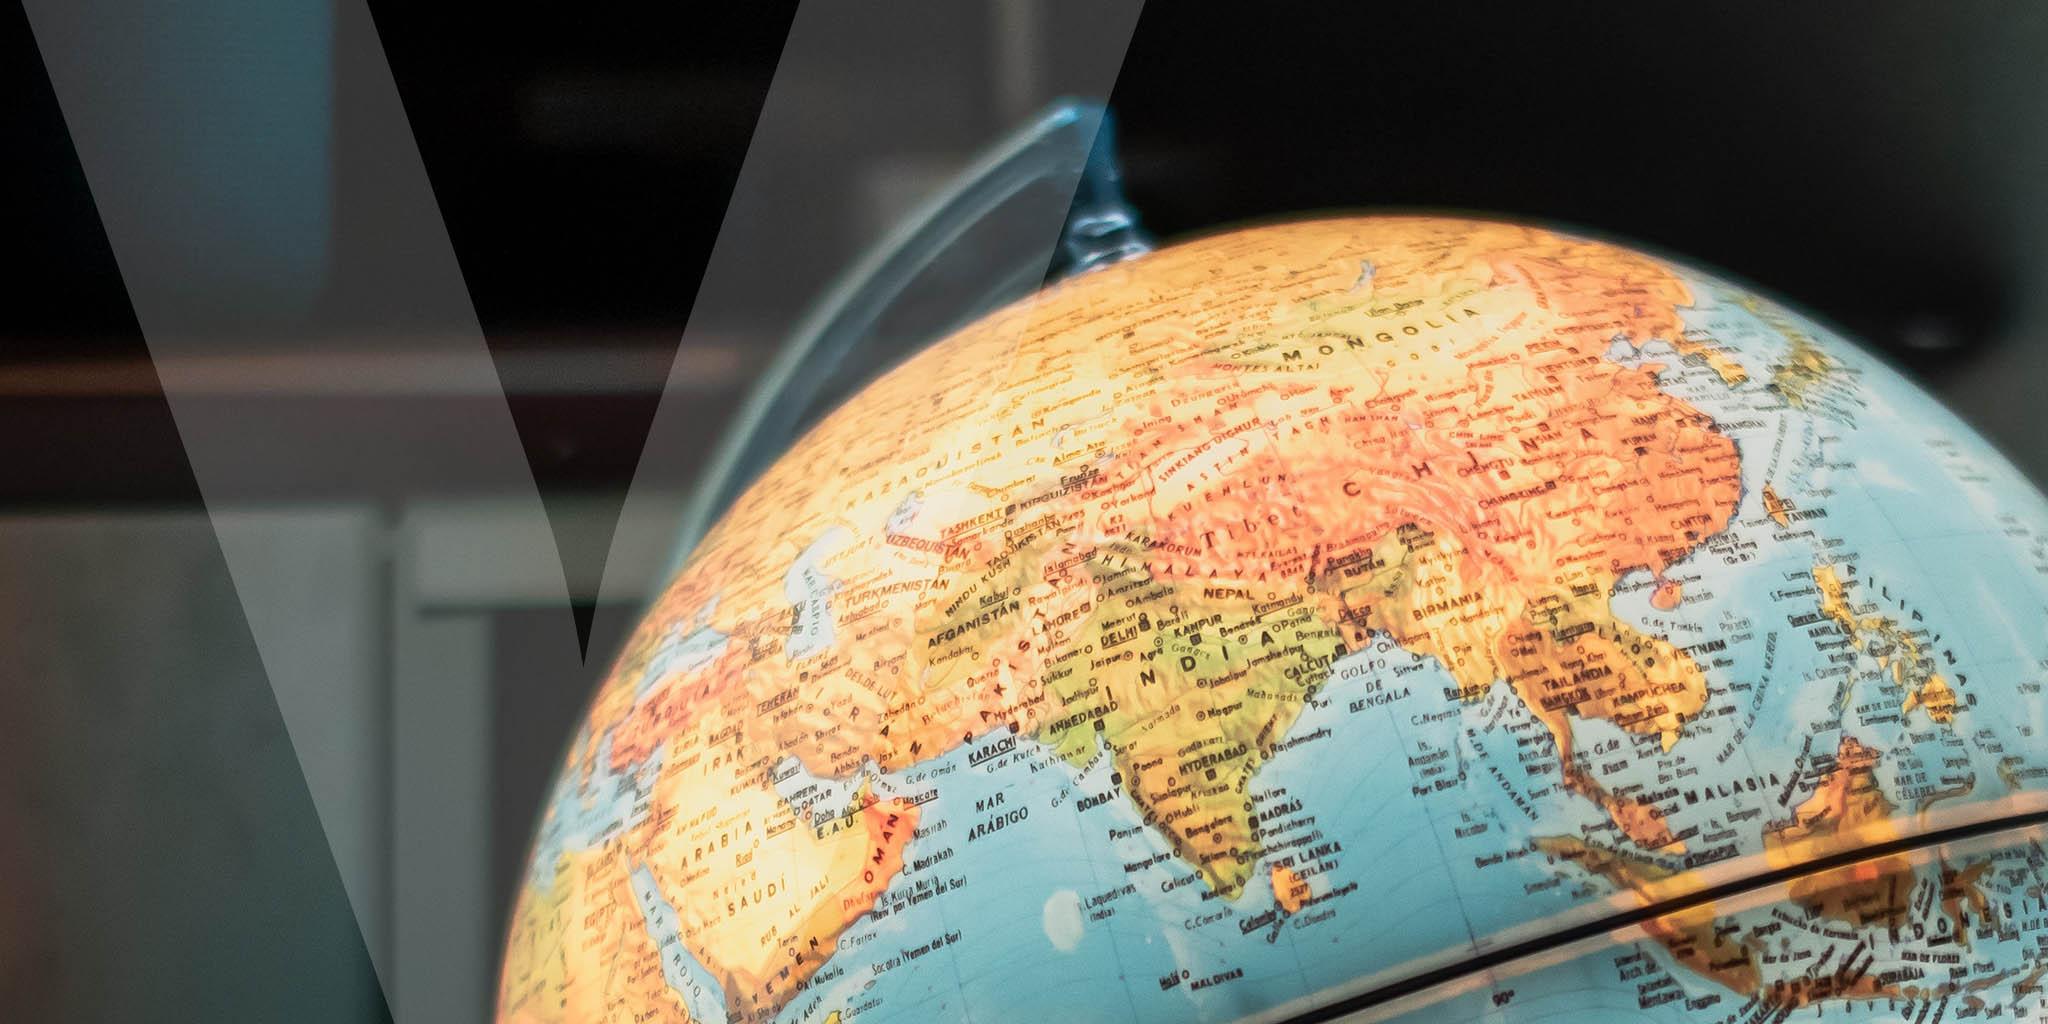 A close-up image of a globe